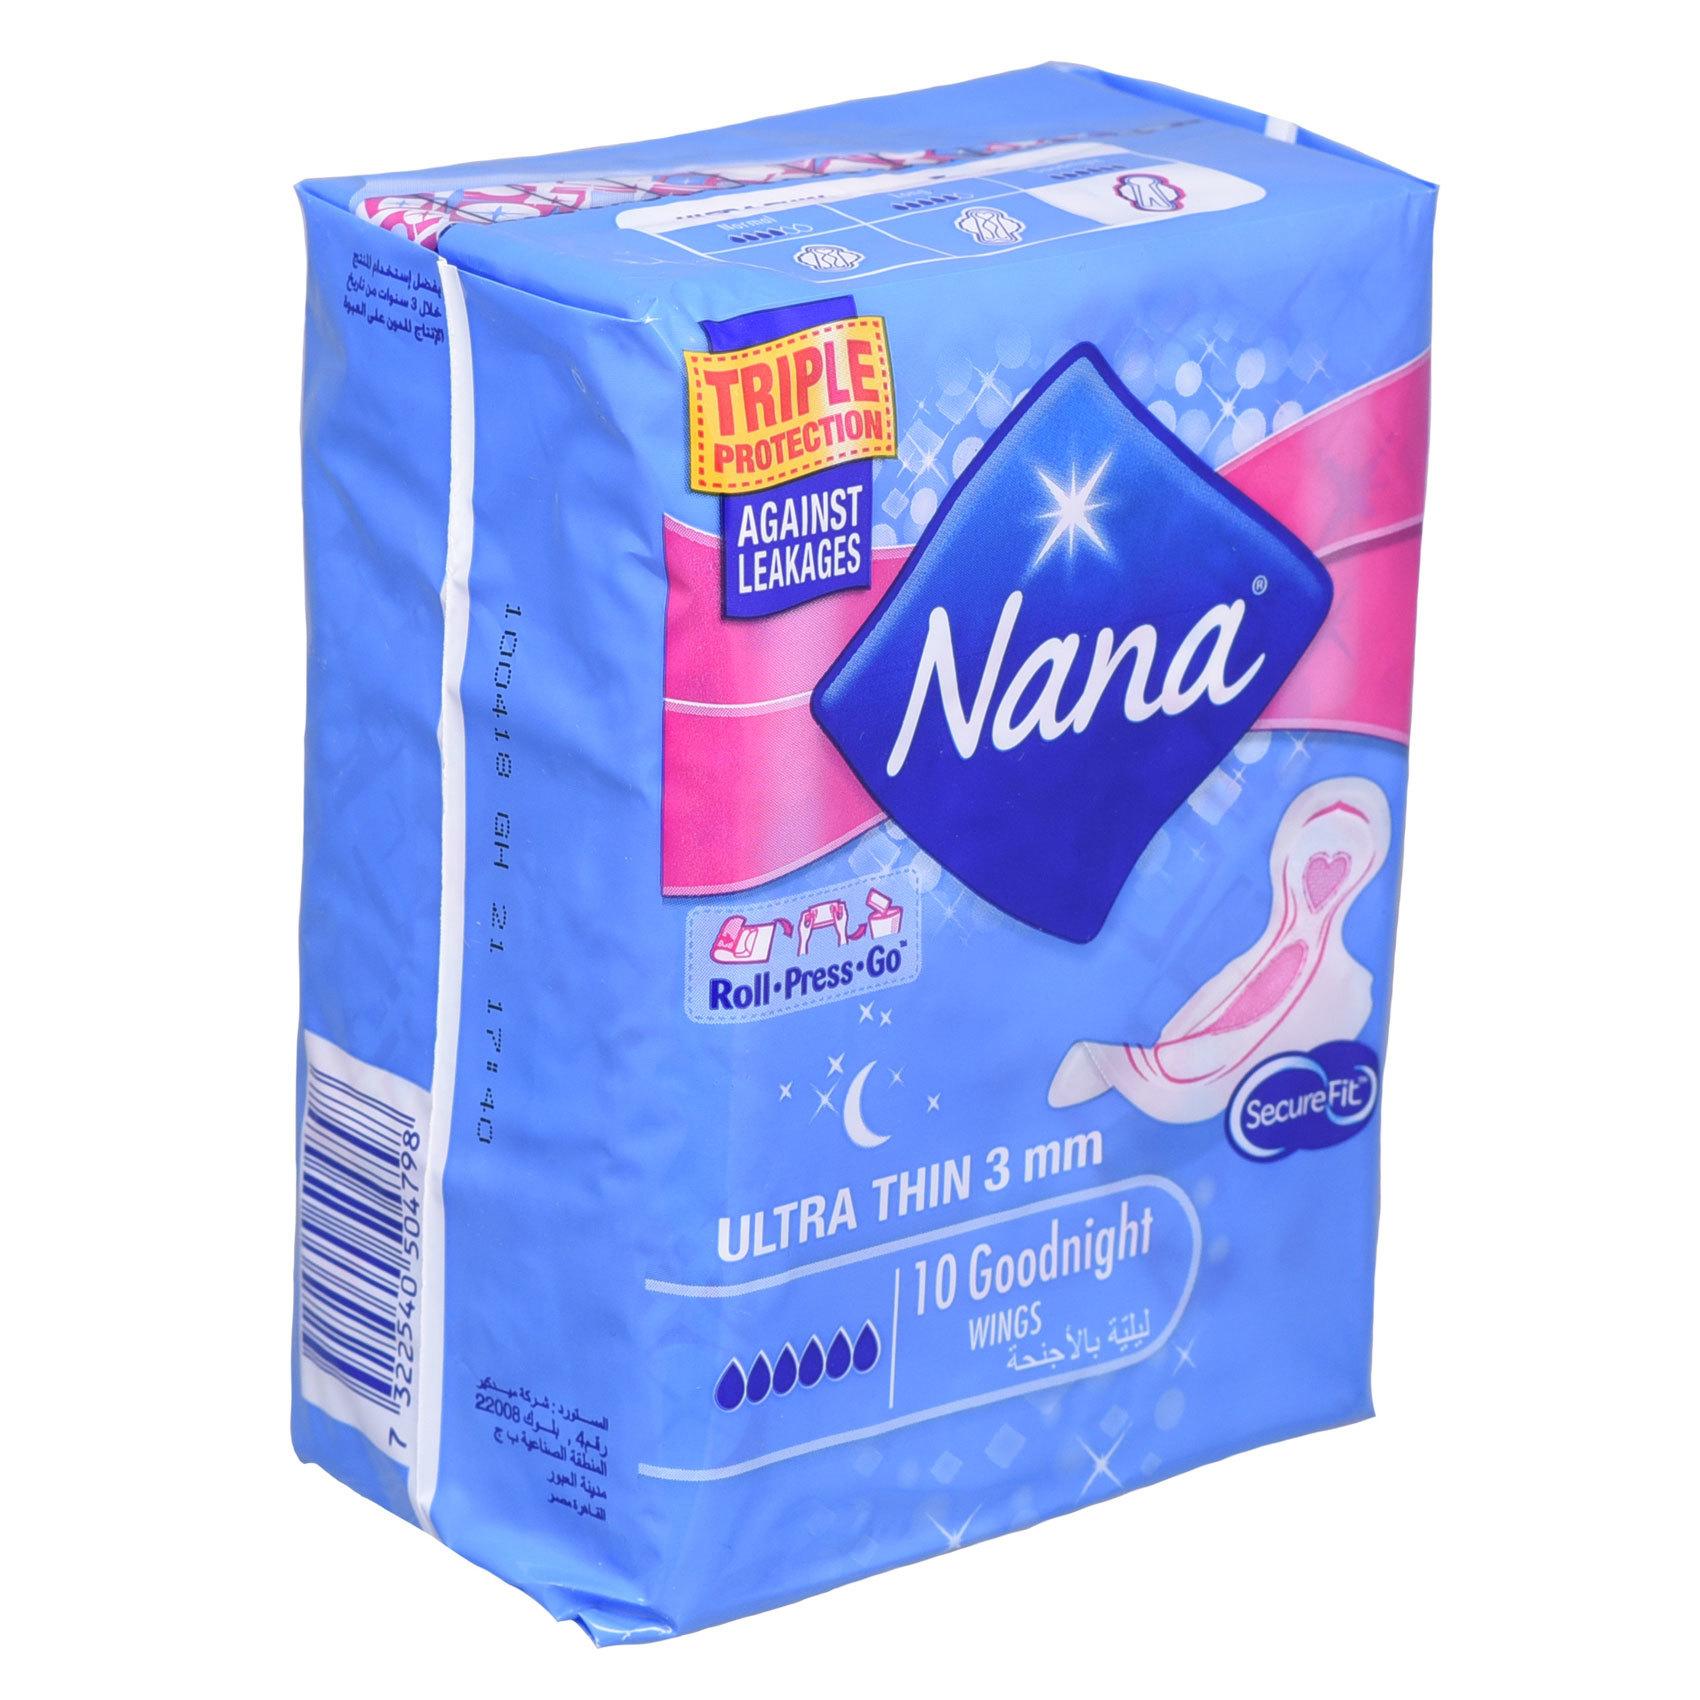 NANA ULTRA GOOD NIGHT 10'S